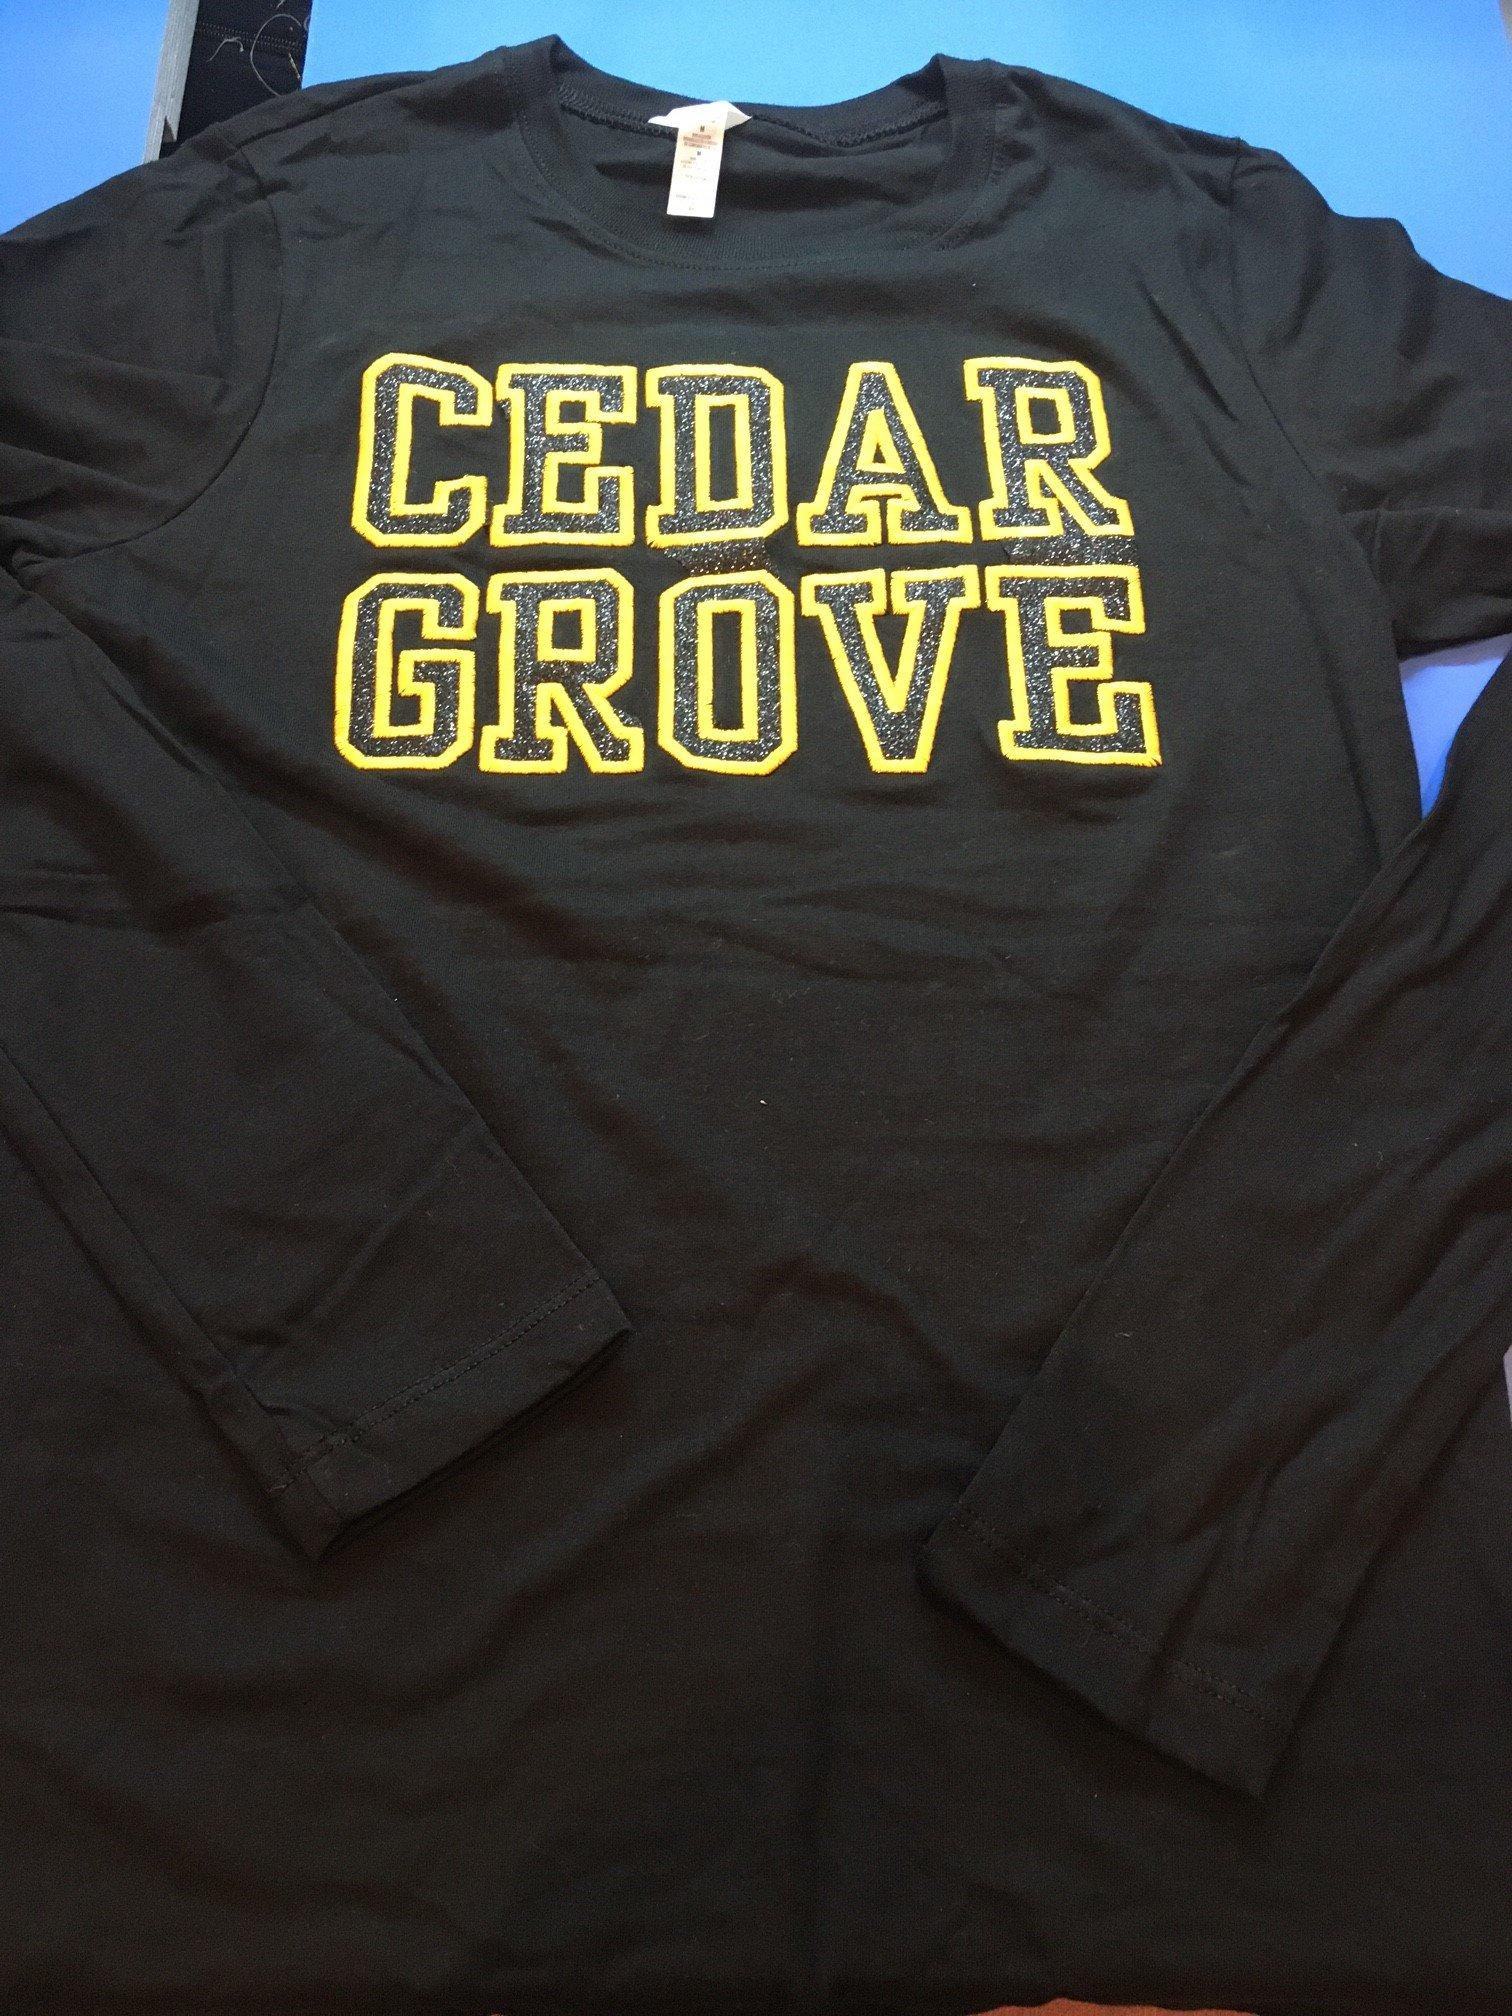 L.A.T. Long Sleeve Top w/Black Glitter flake and Athletic gold Emb. Cedar Grove